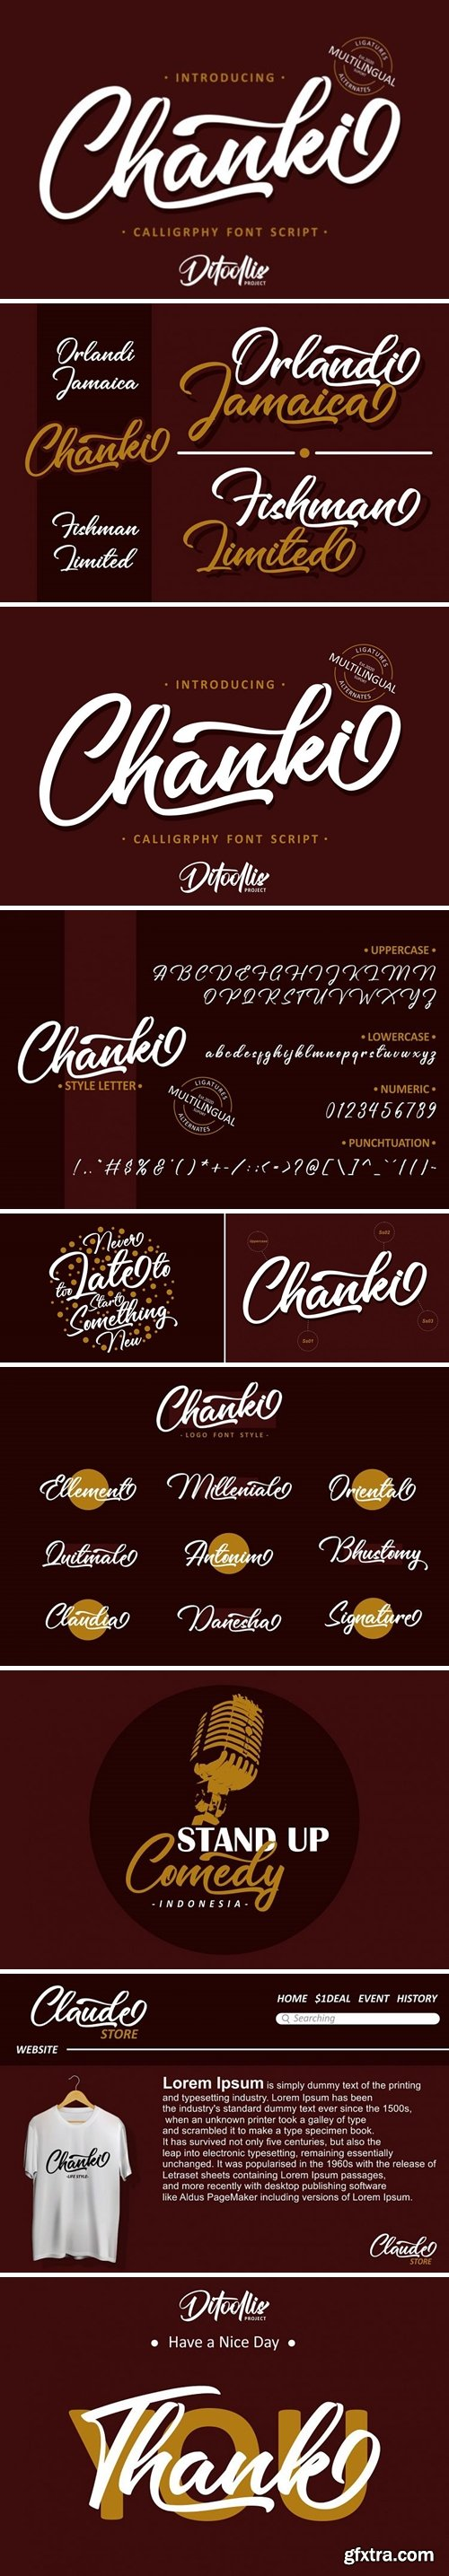 Fontbundles - Chanki Calligraphy Script 520816